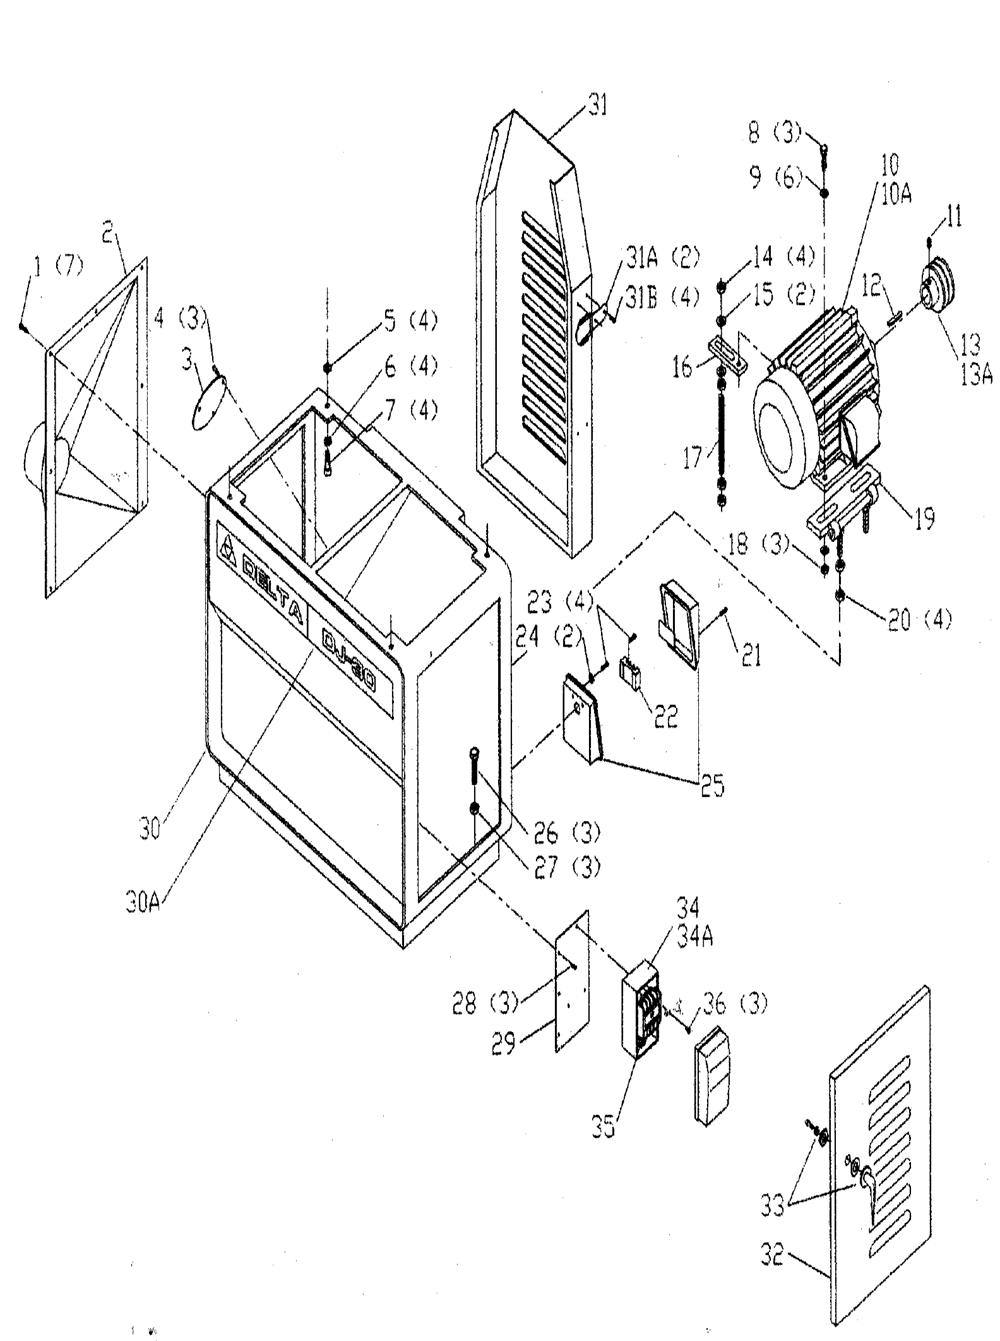 delta jointer wiring diagram polaris 800 wiring diagram